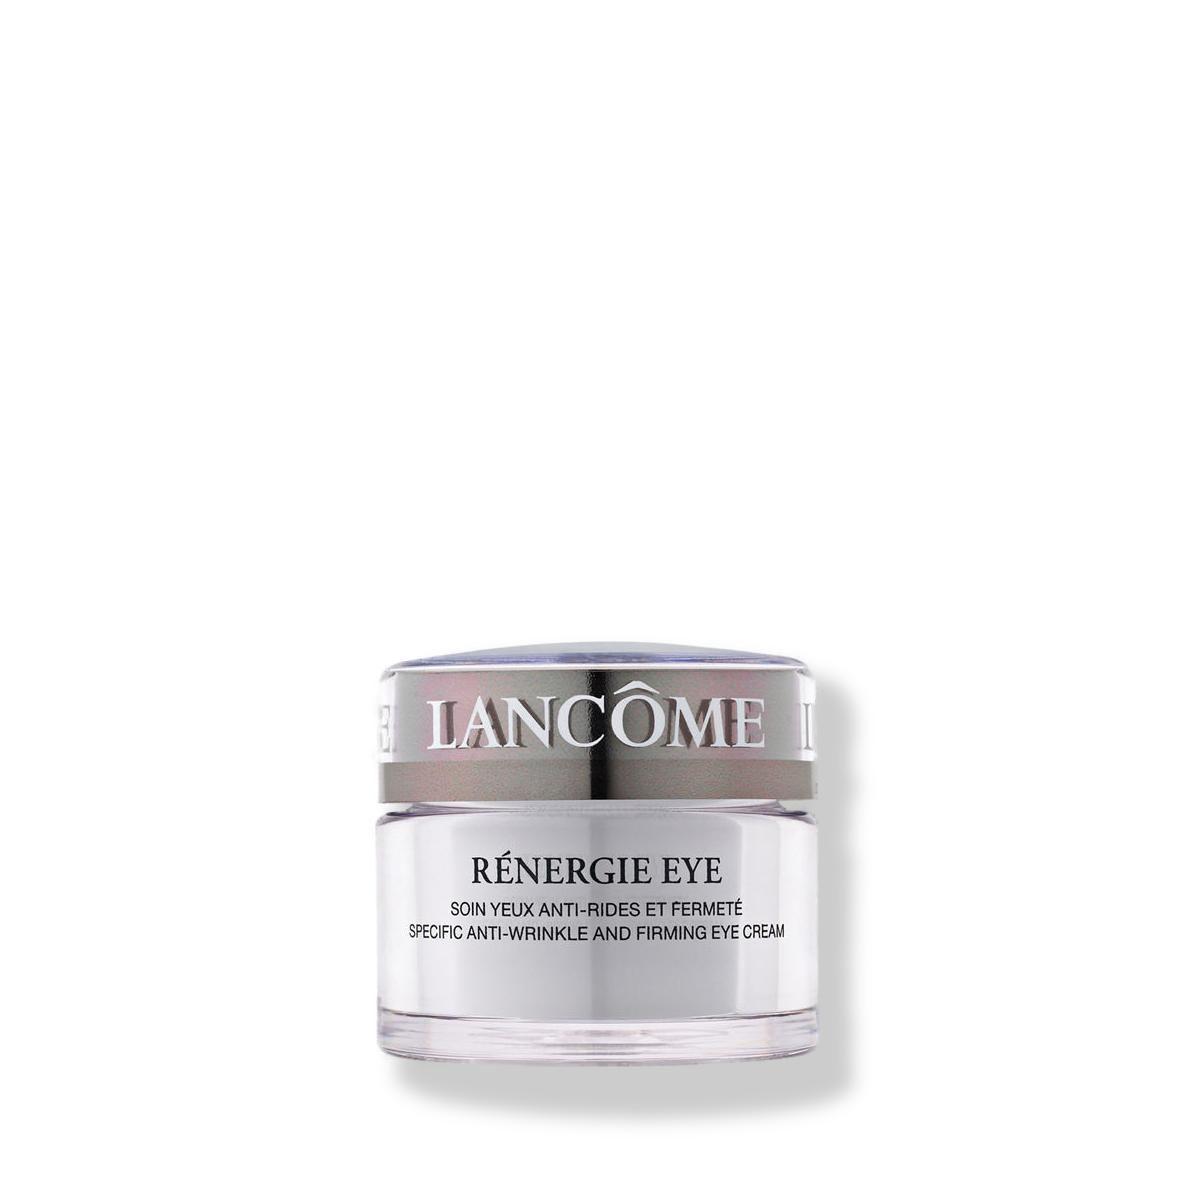 Lancôme Renergie Eye Creme